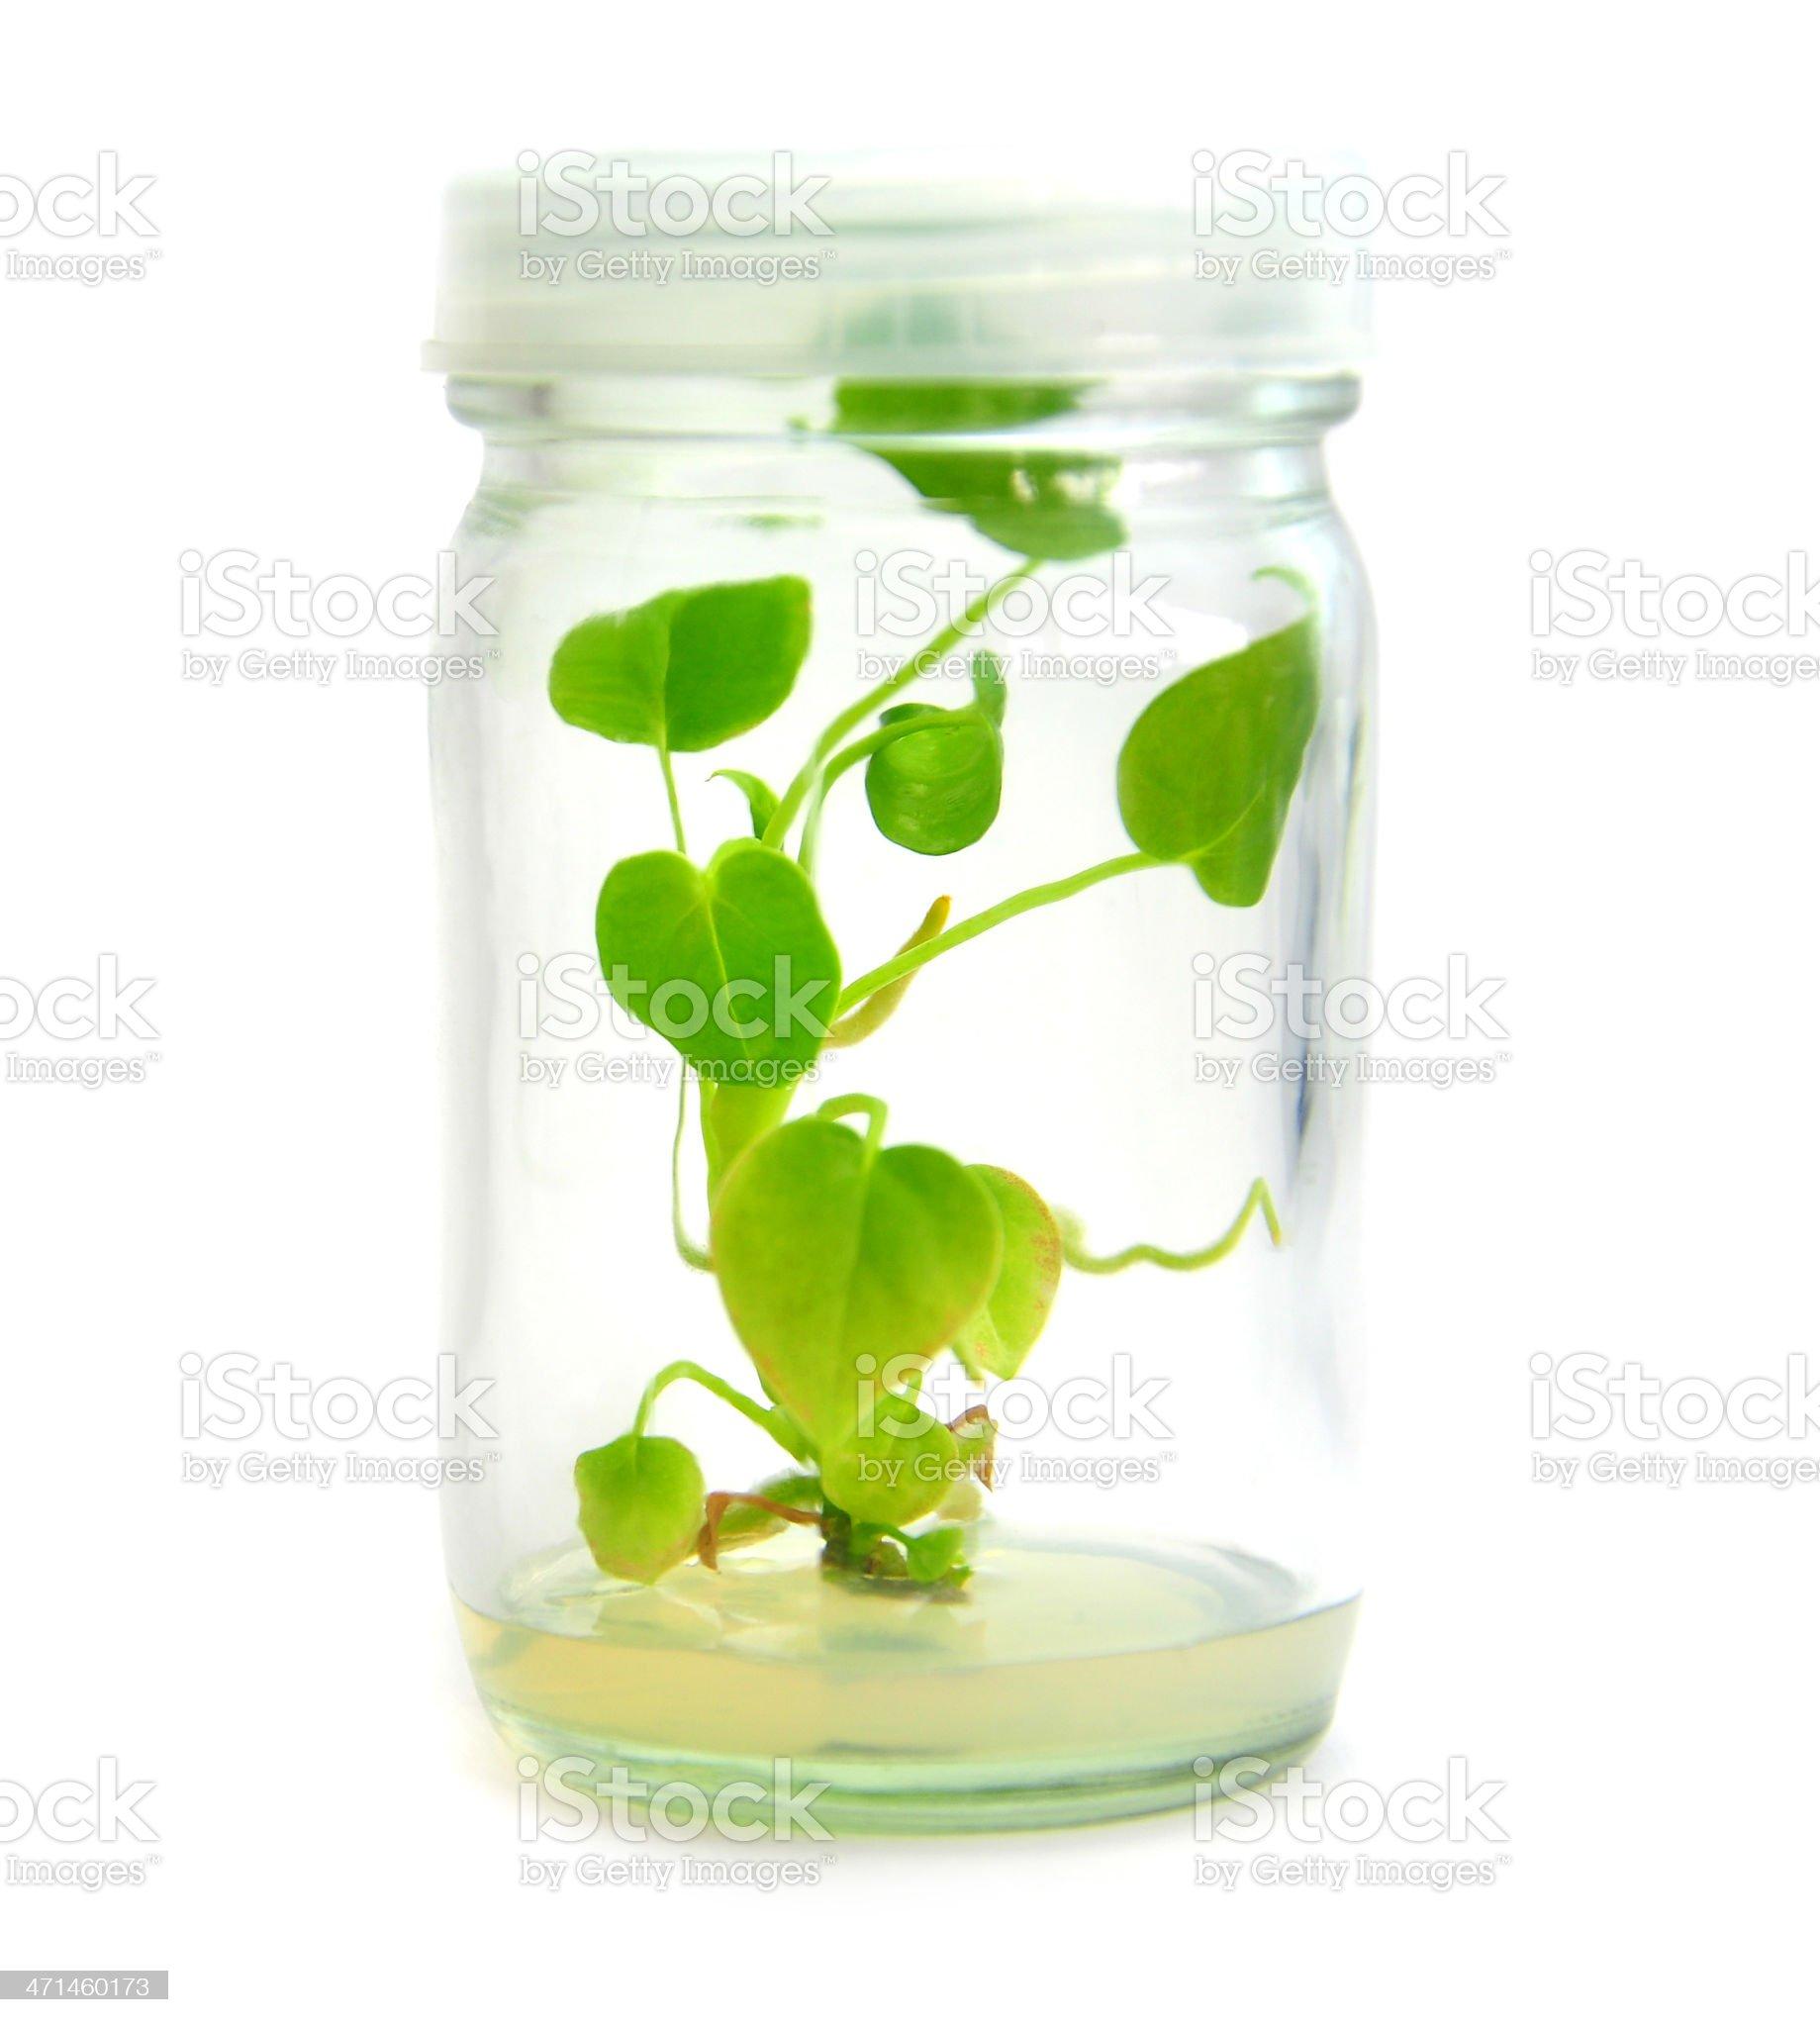 Micro propagated plant royalty-free stock photo